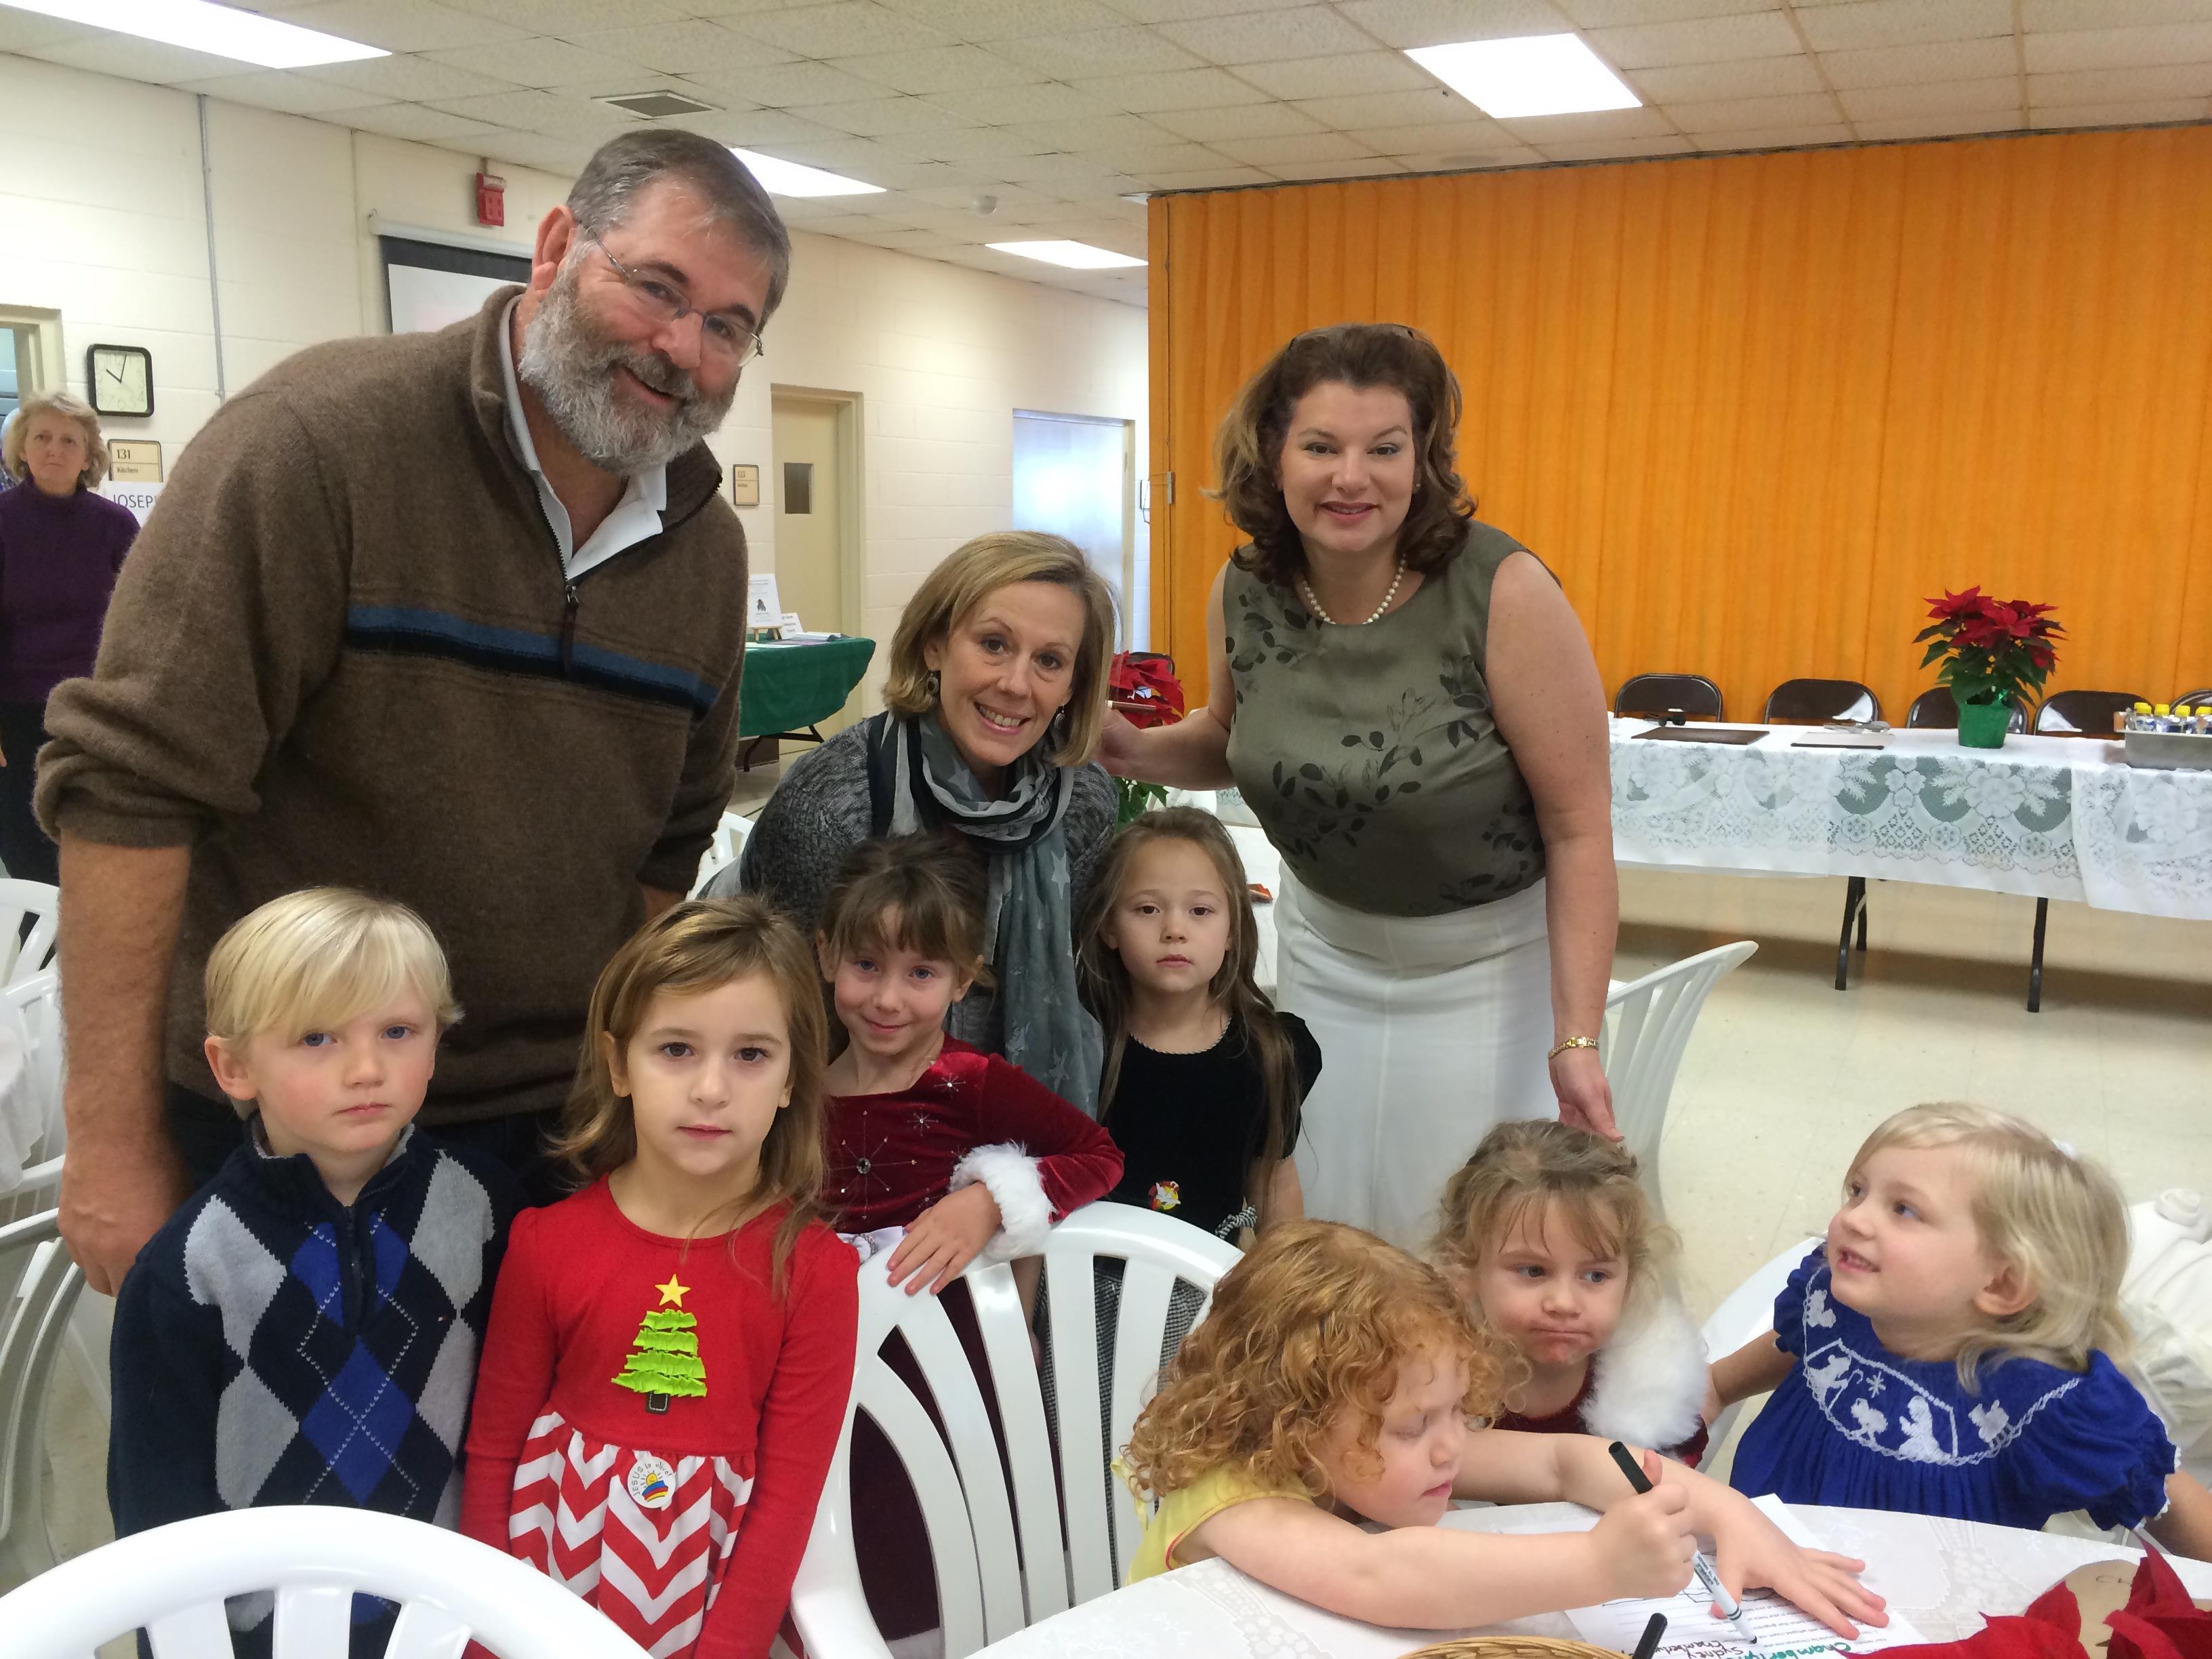 Sunday School during Advent